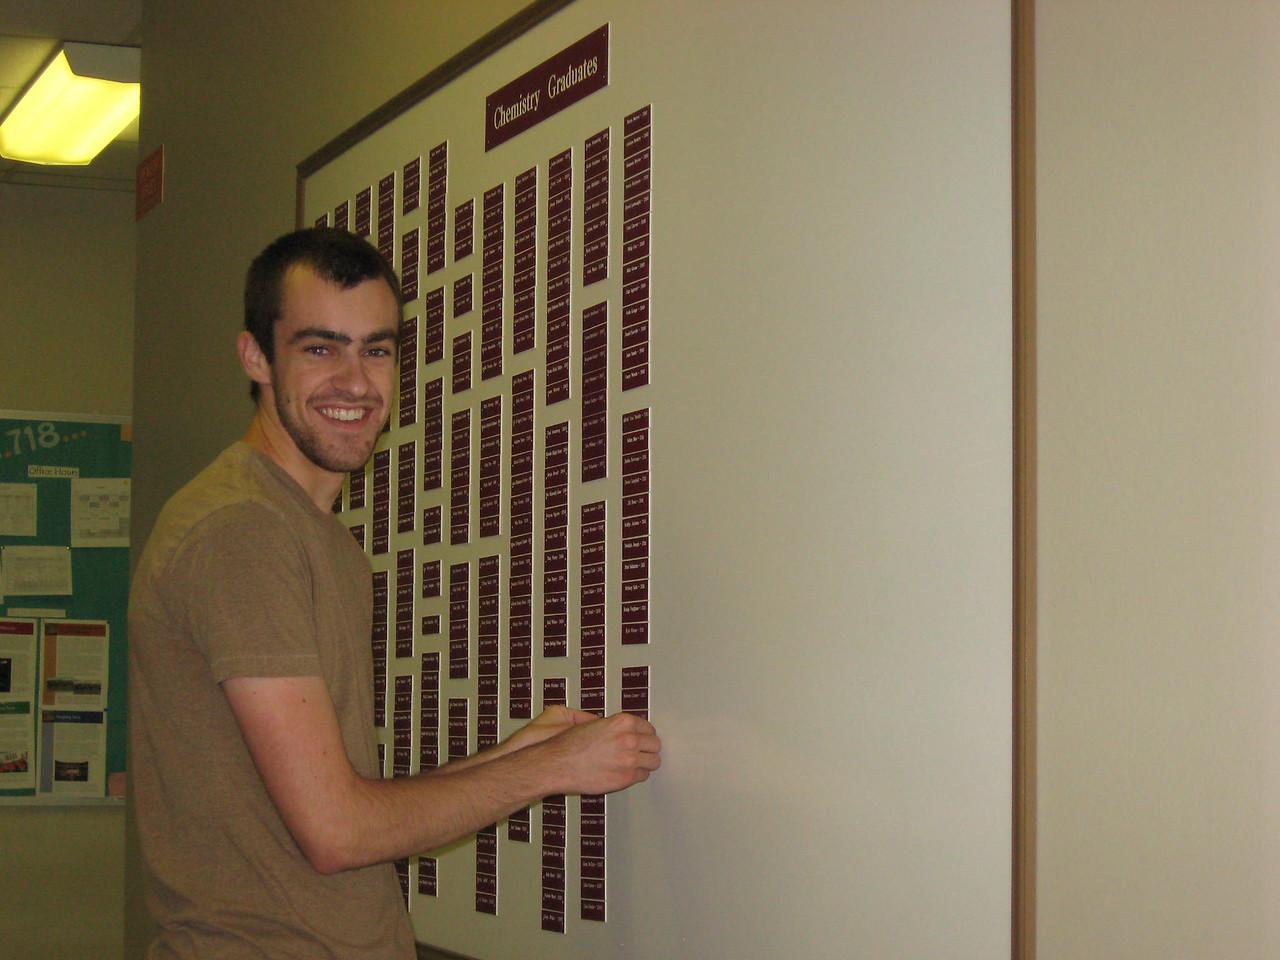 Jared Evatt putting hisr nameplate on the Chemistry Graduates board.